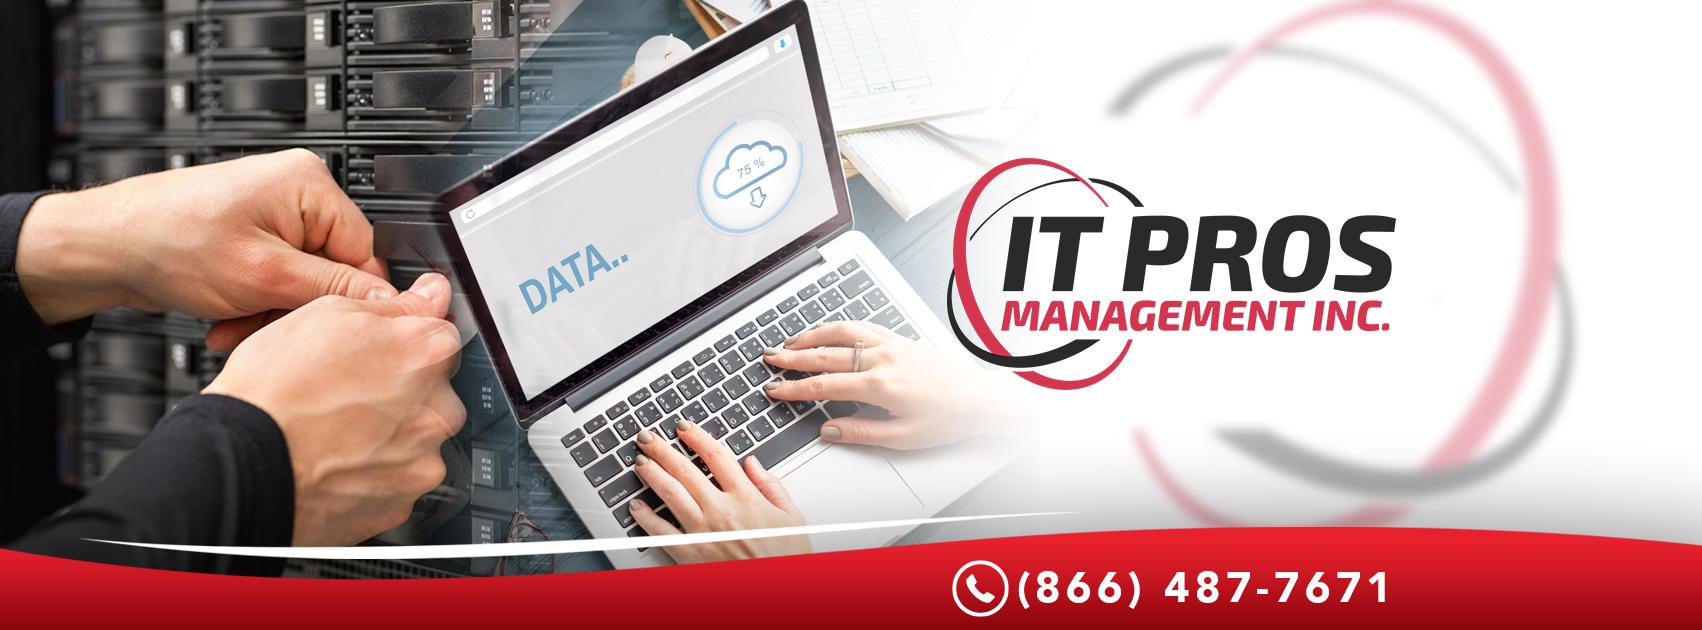 IT Pros Management Inc reviews | Technology at 303 North Glenoaks Boulevard - Burbank CA